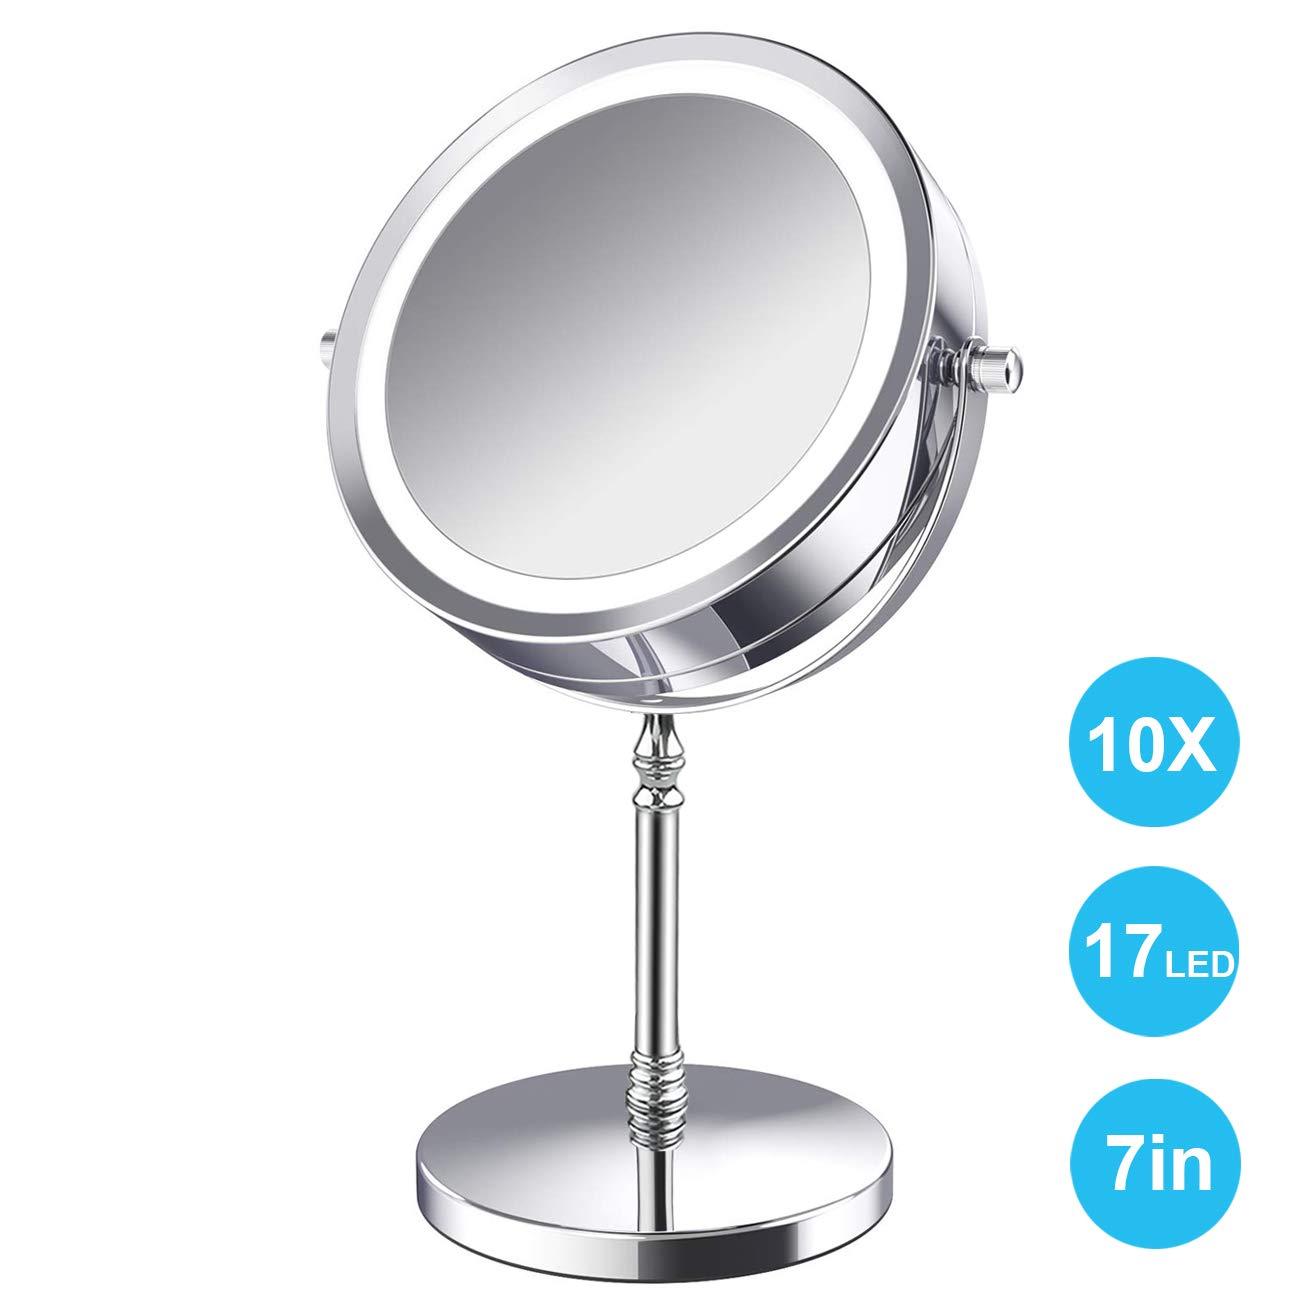 AMELAR LED Kosmetikspiegel Beleuchtet 10x Vergr/ö/ßerungsspiegel im Badezimmer,7-Zoll-Vergr/ö/ßerung Makeup Spiegel mit Beleuchtung Doppelseitige